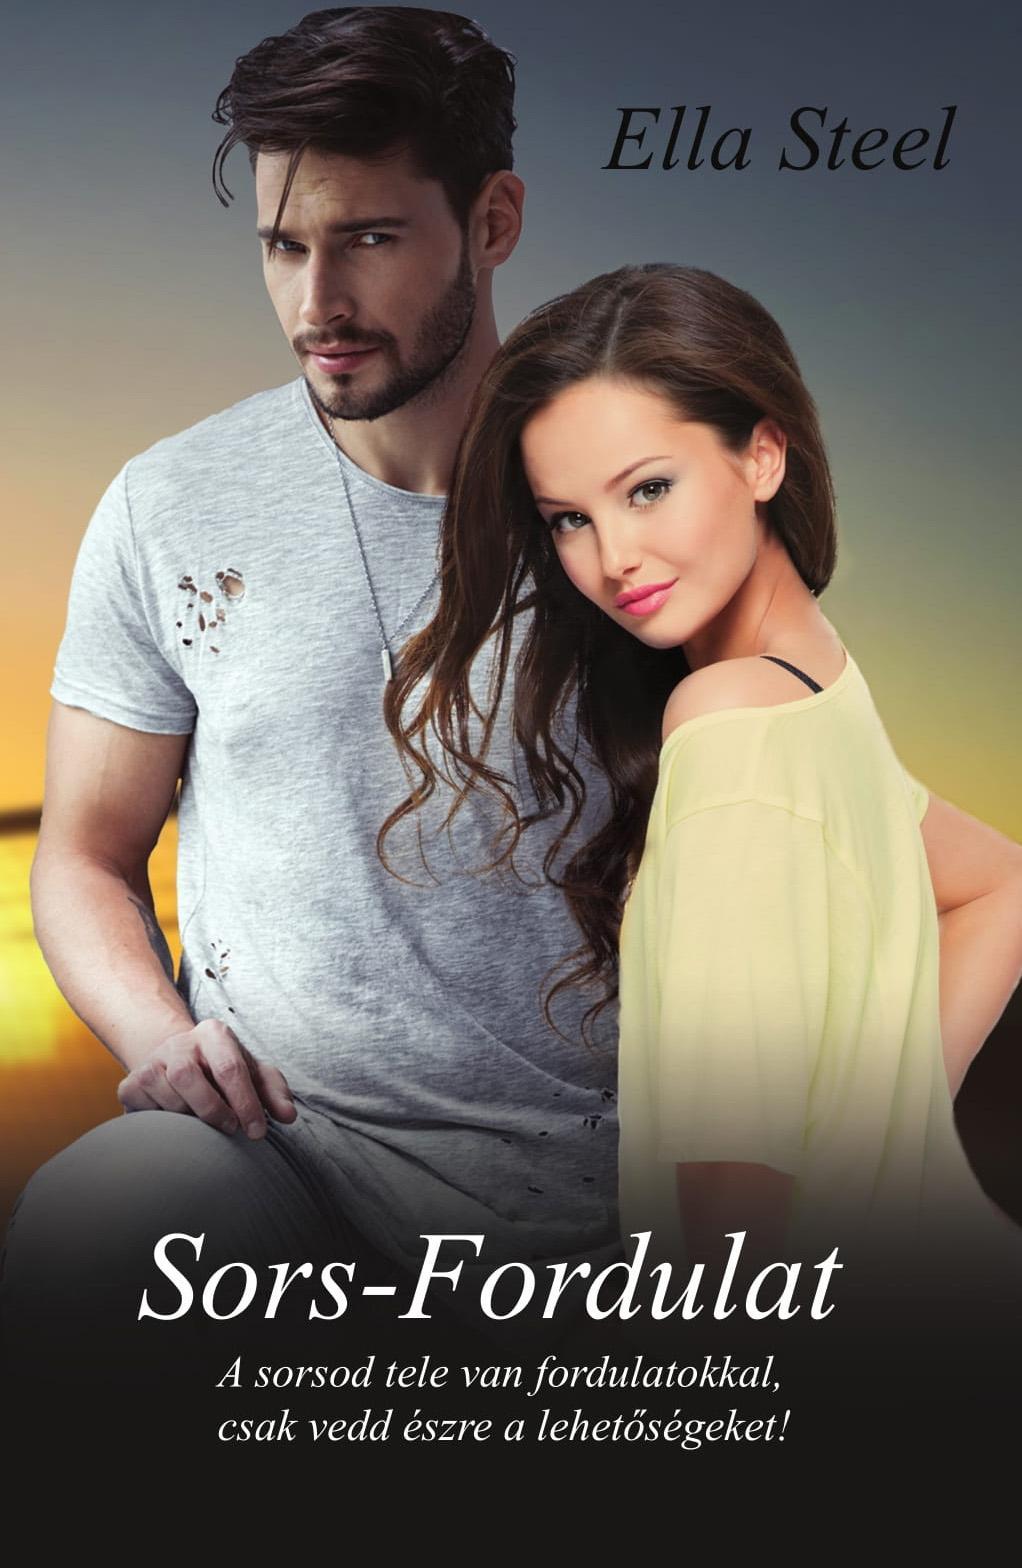 SORS-FORDULAT